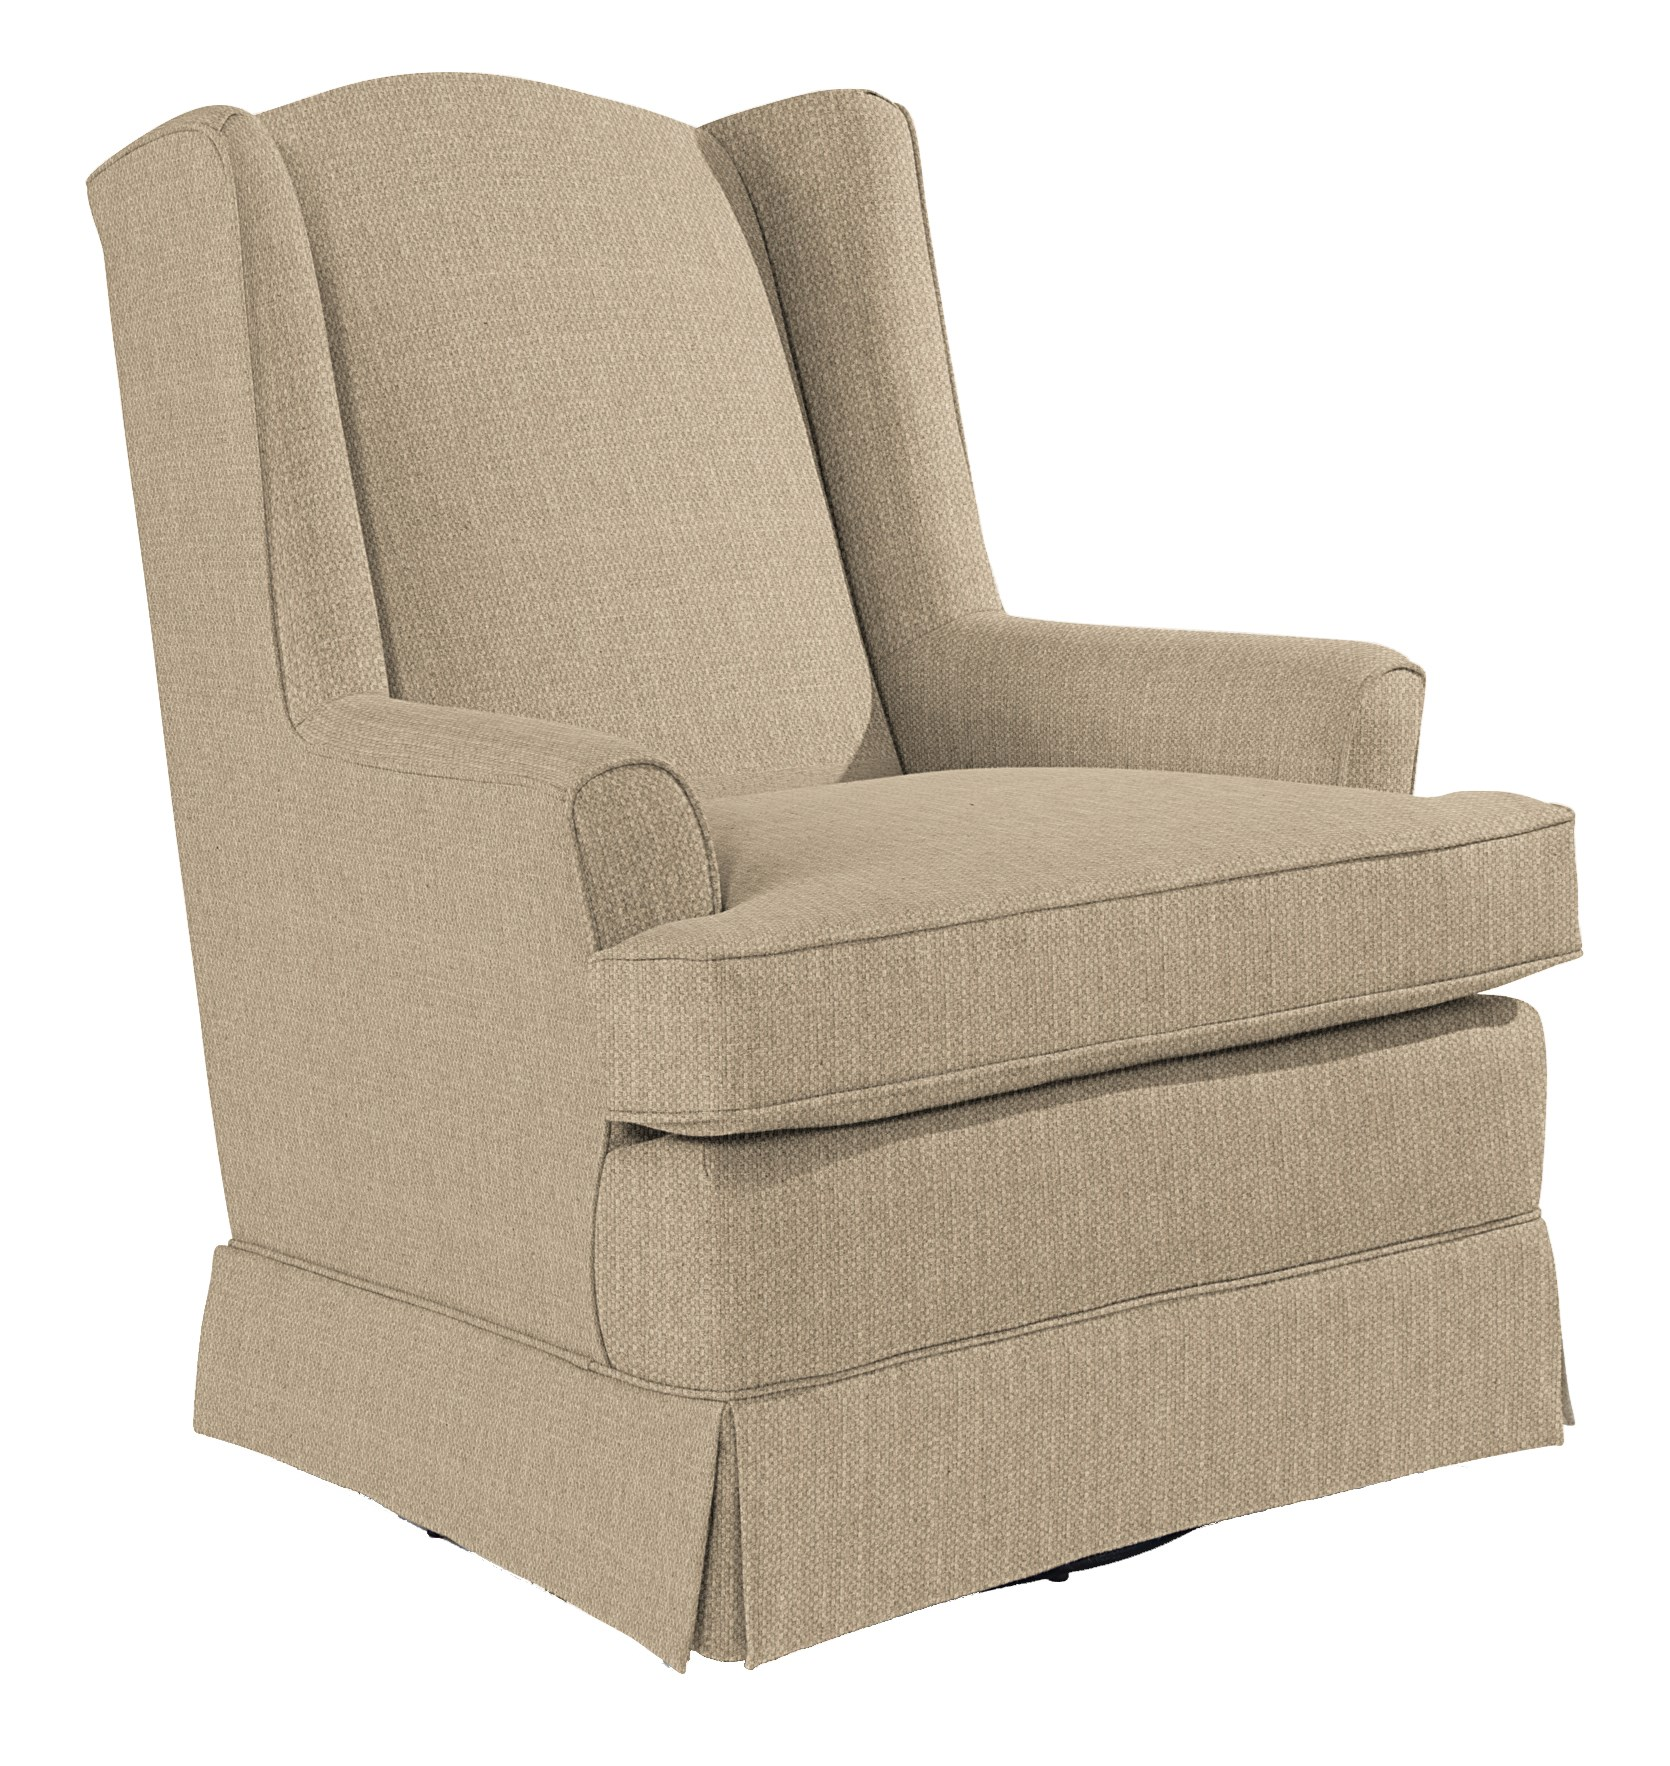 Best Home Furnishings Chairs - Swivel Glide Natasha Swivel Glider - Item Number: 7147-20007